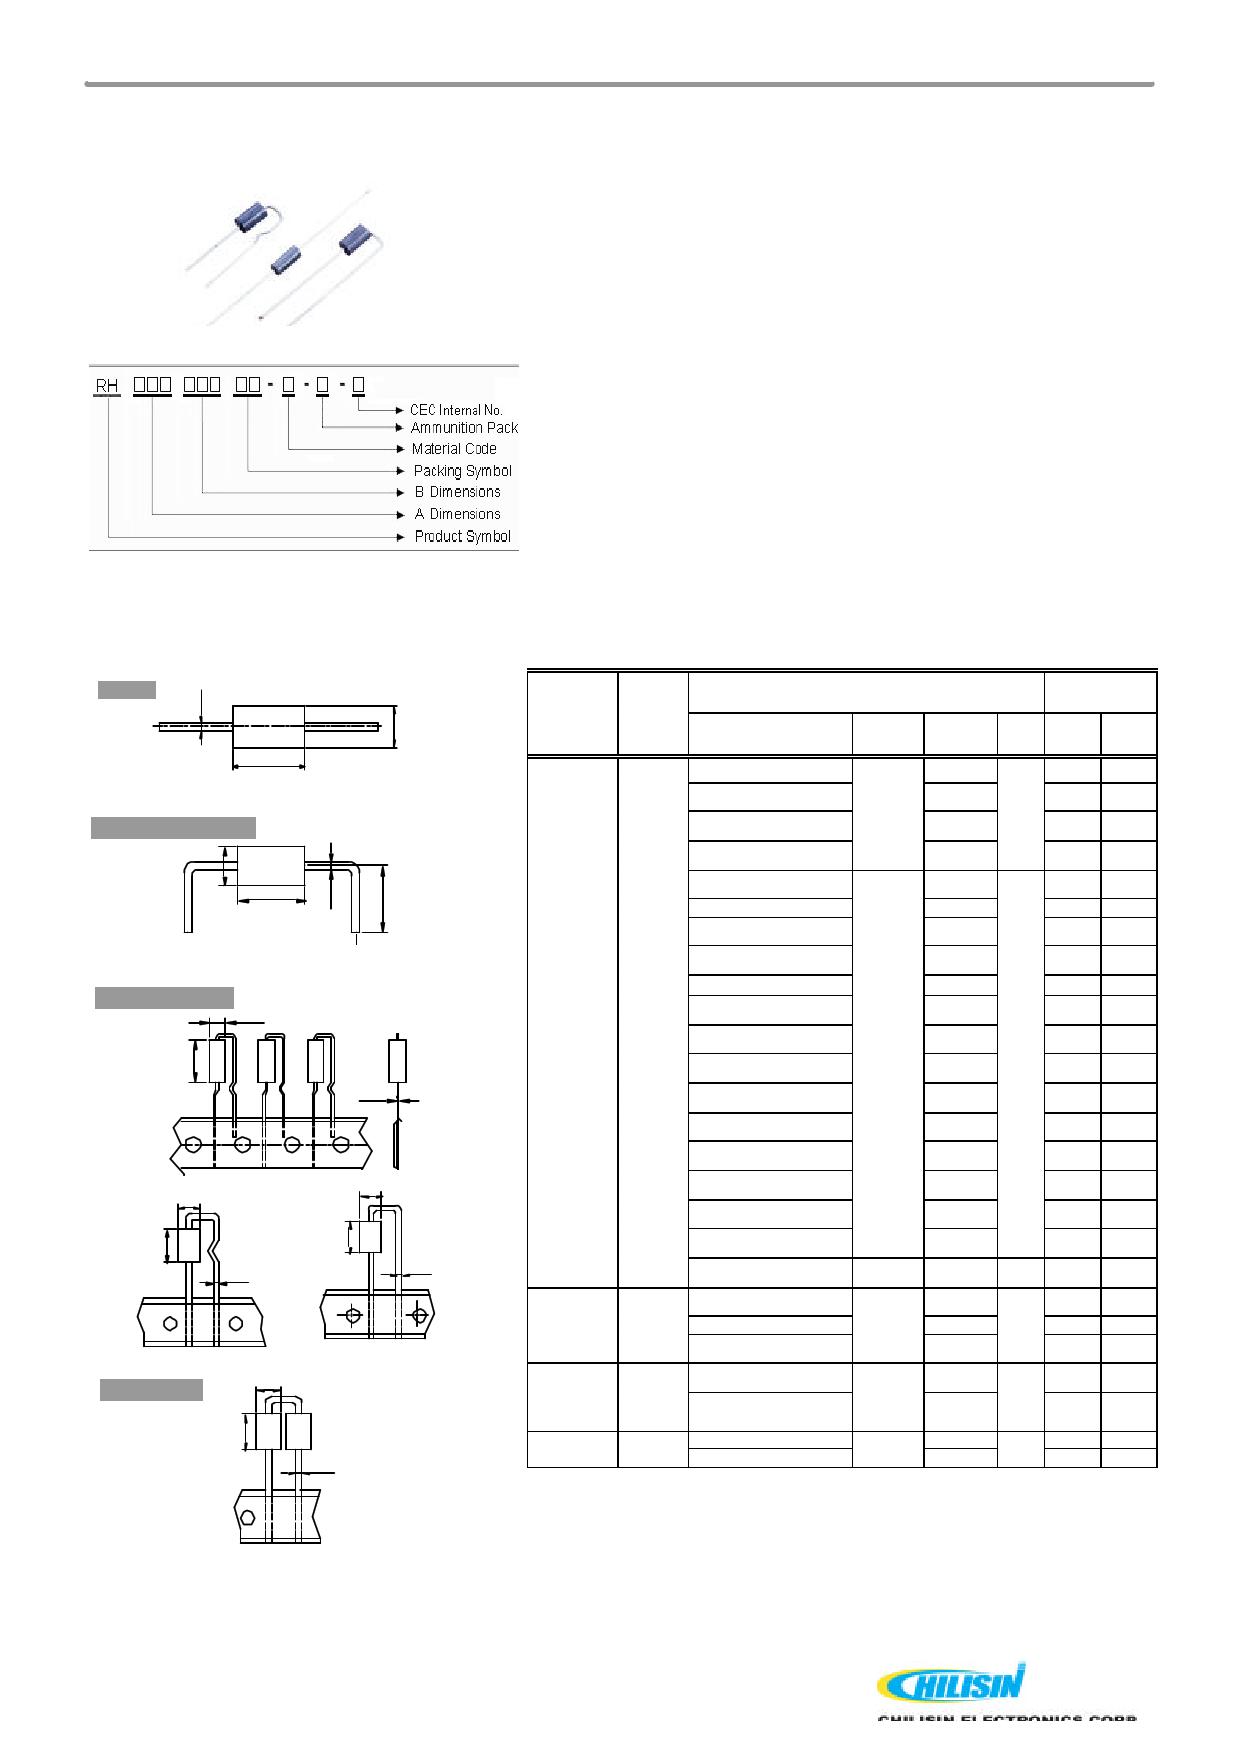 RH02504 데이터시트 및 RH02504 PDF